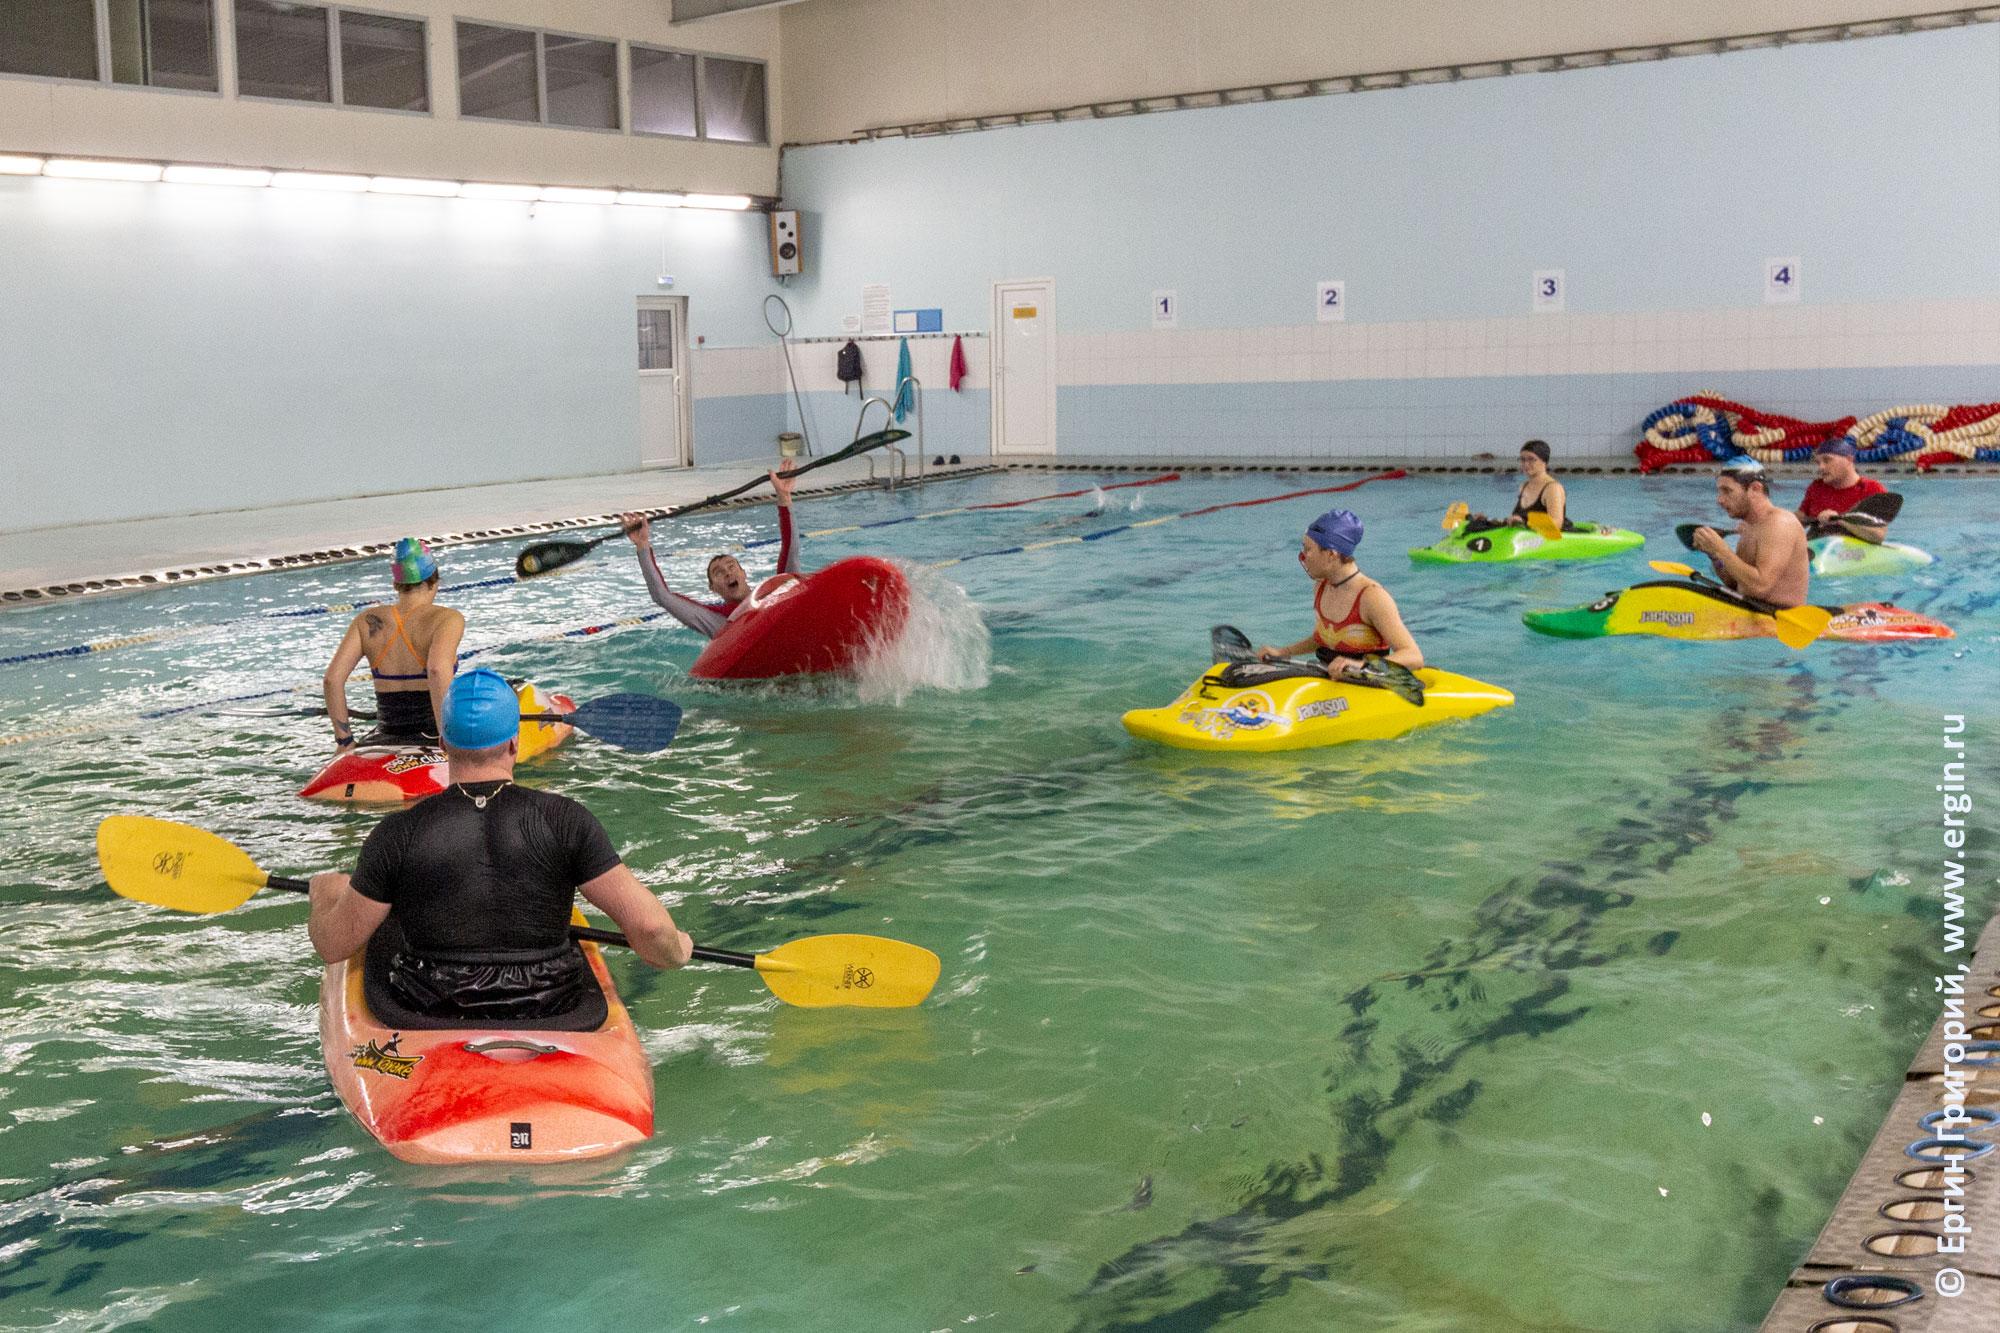 Фристайл-каякинг акробатика на каяке на гладкой воде бассейна